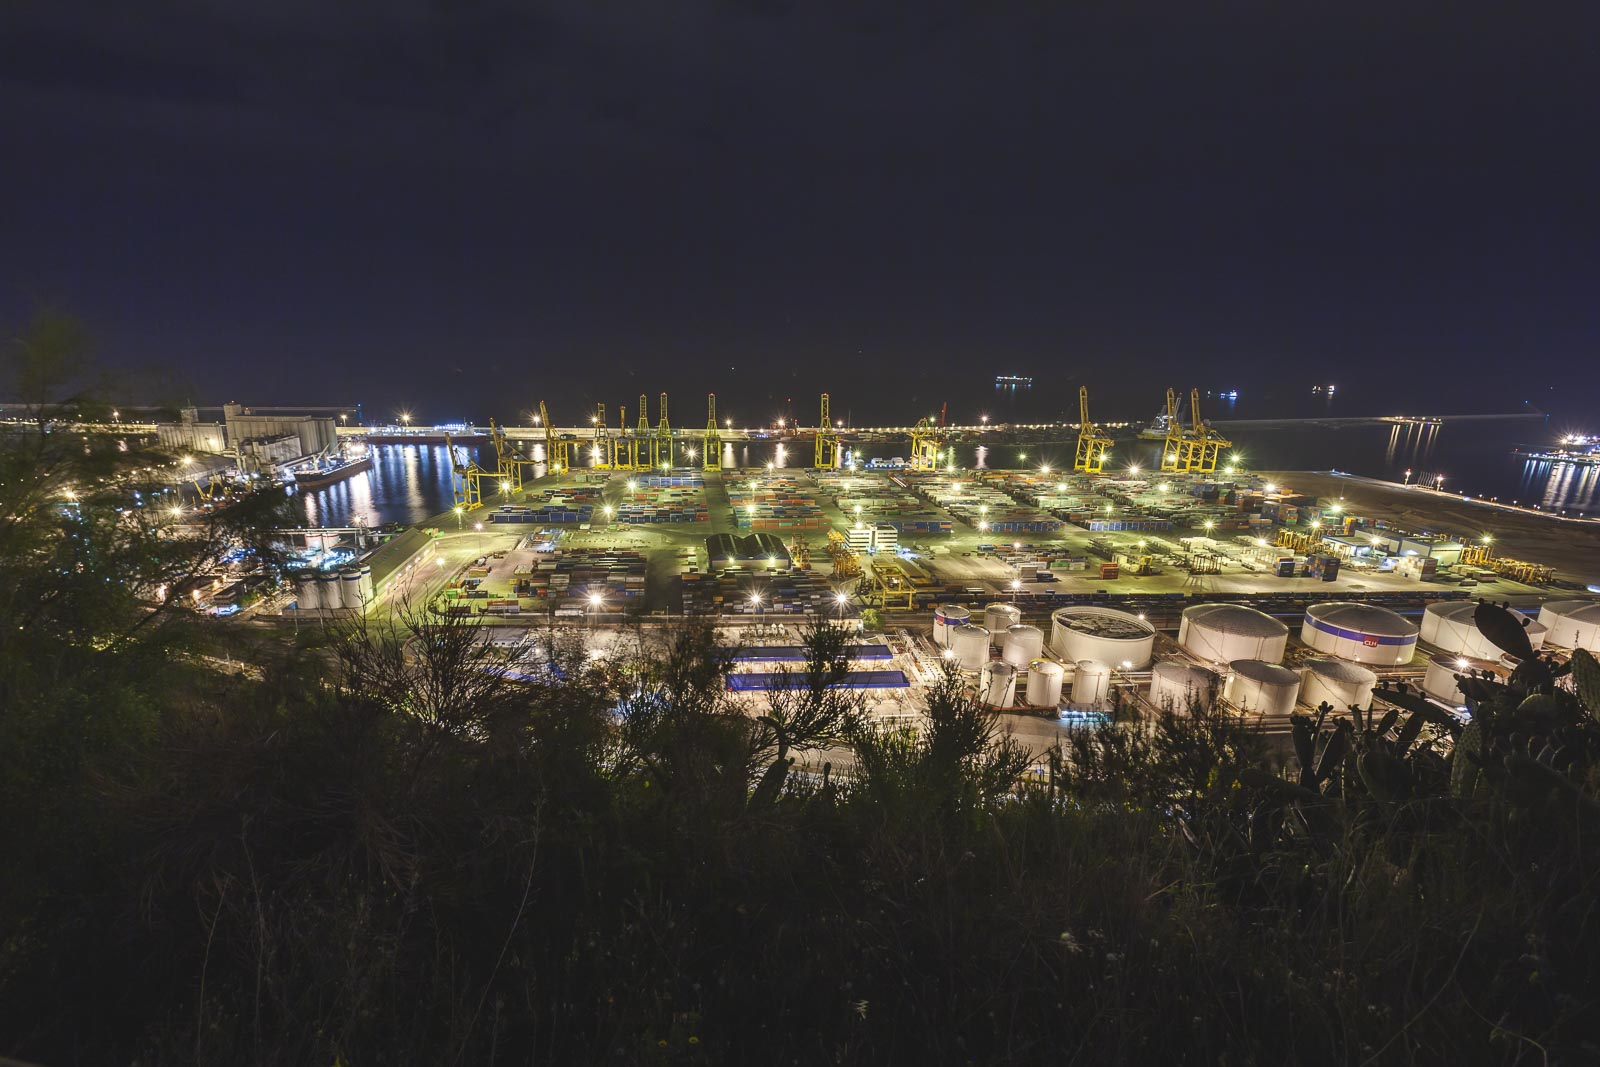 Barcelona Harbor at night